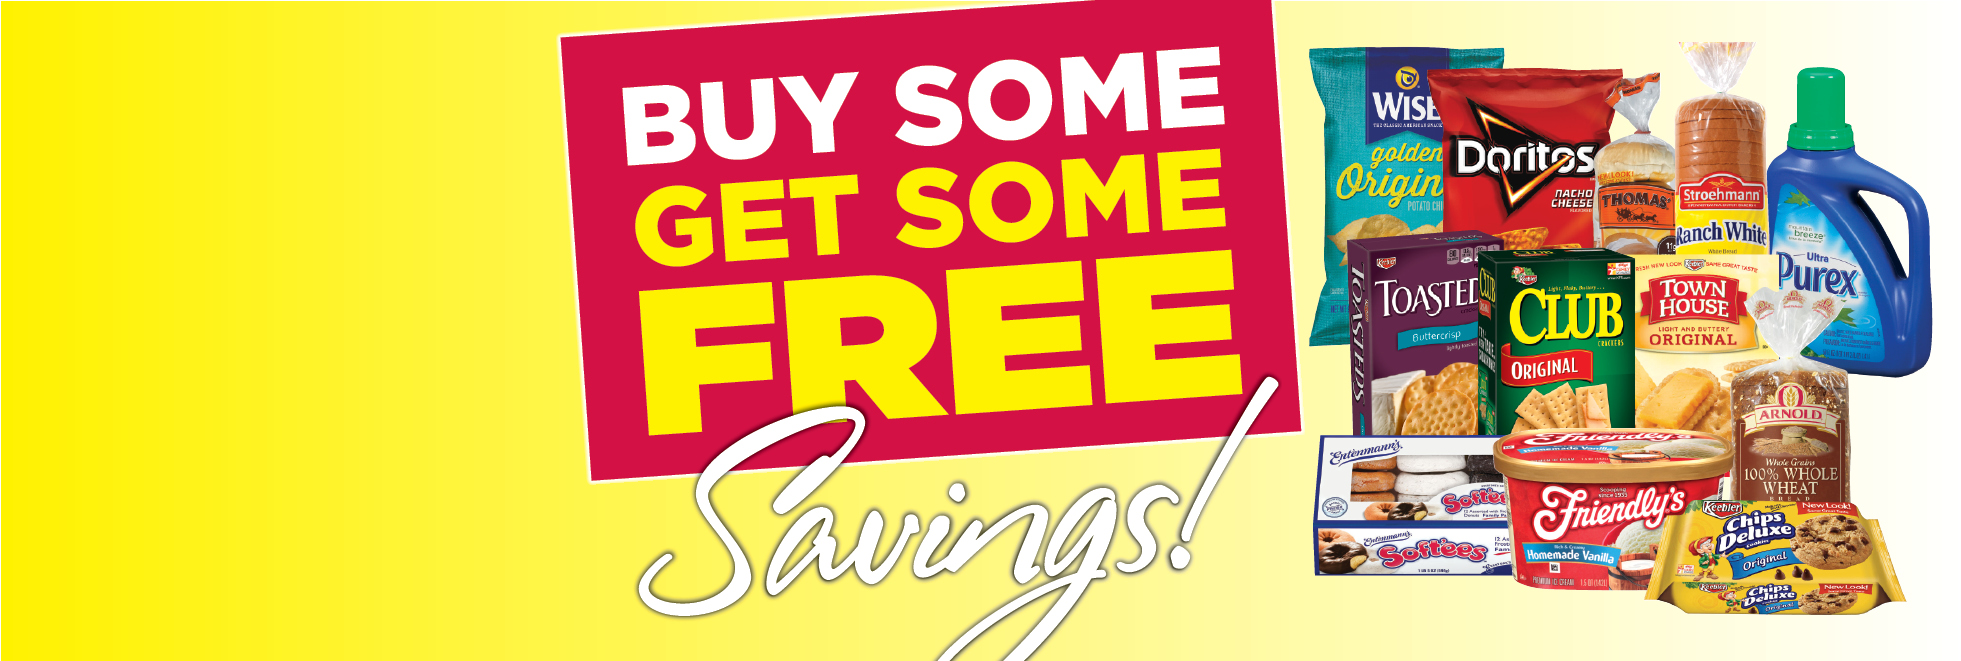 Buy Some Get Some Free Savings